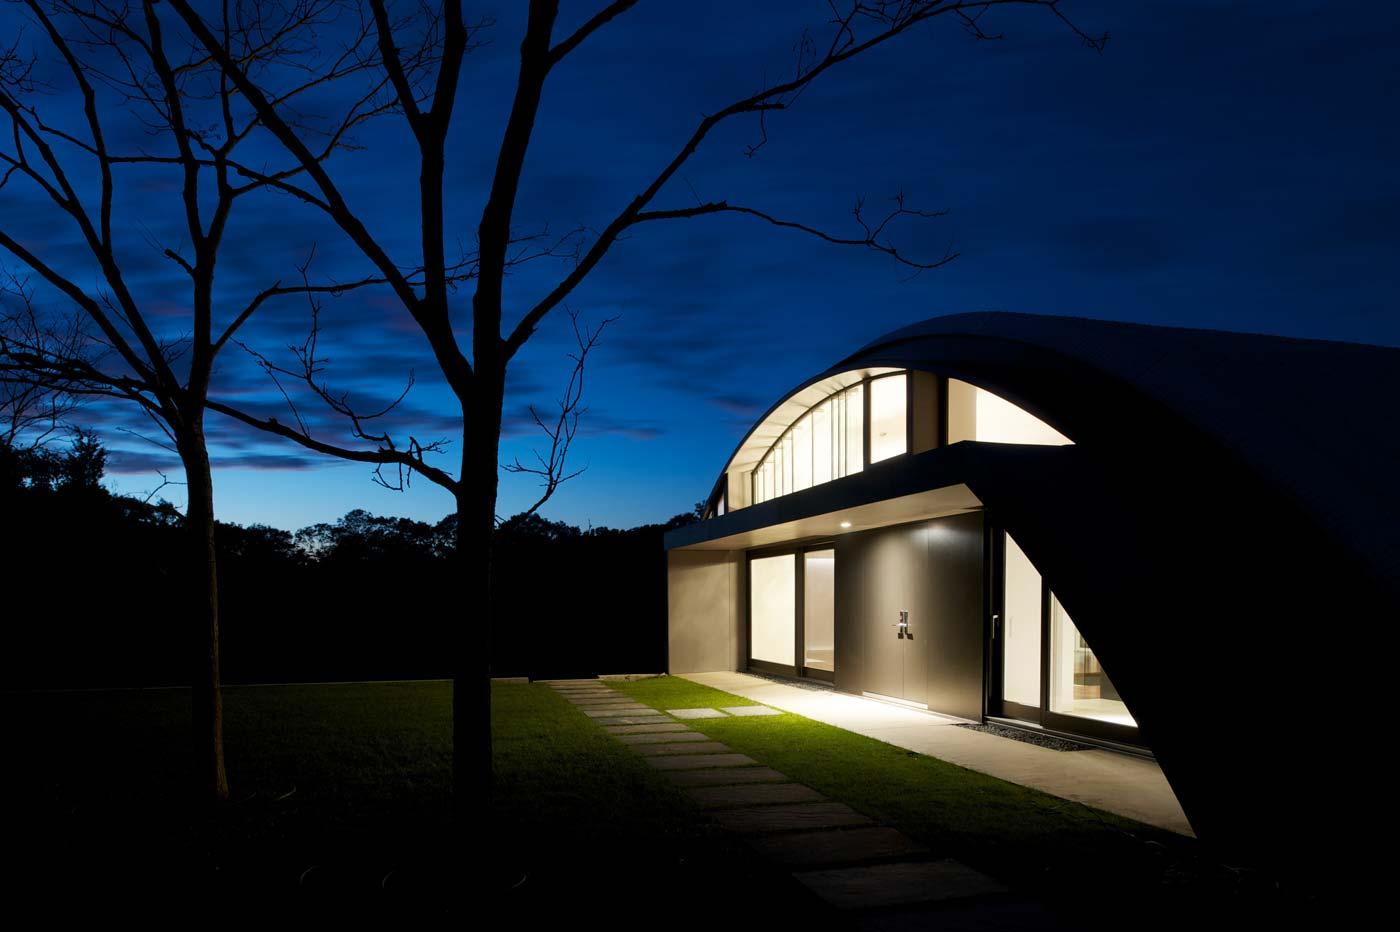 The Arc House by Maziar Behrooz